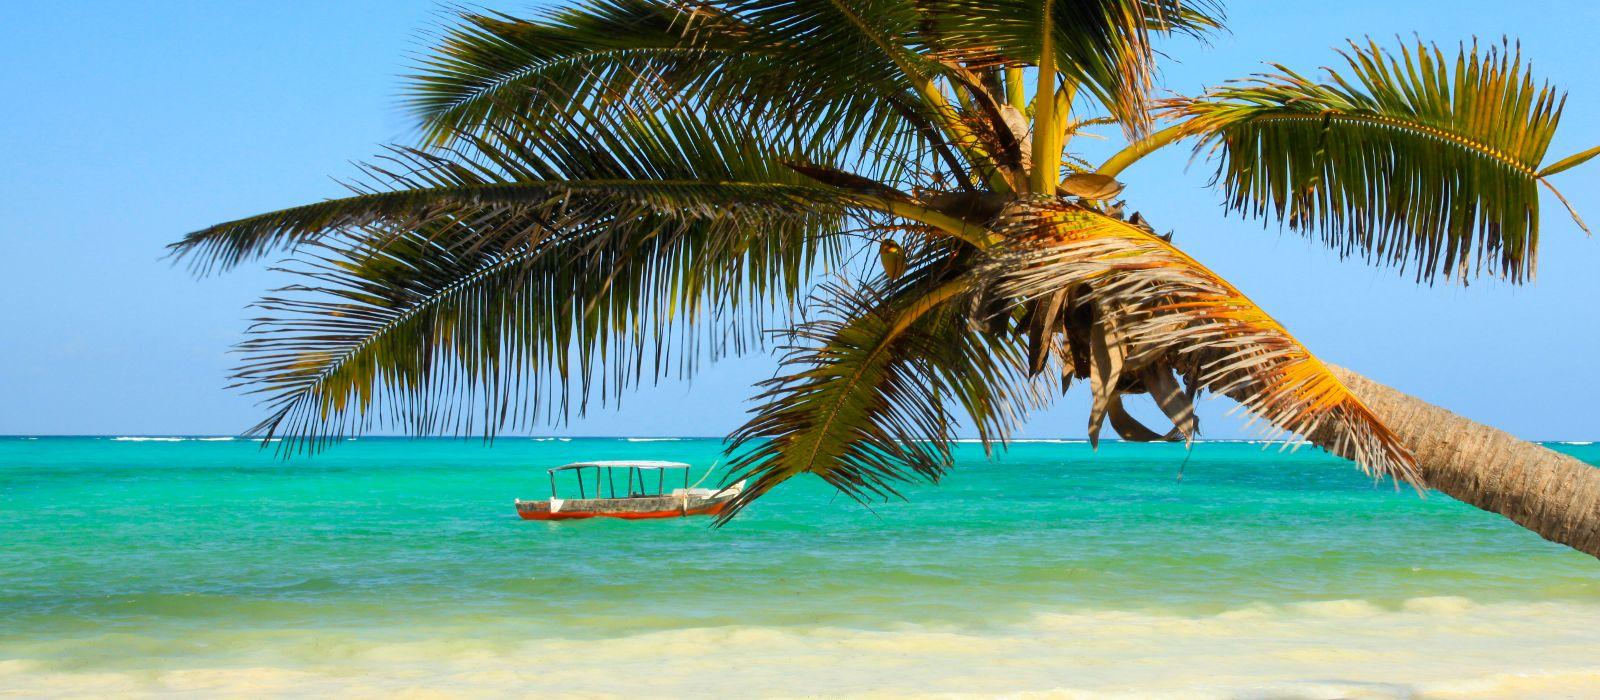 Kenia und Tansania: Kamel Trekking und Strandurlaub Urlaub 4